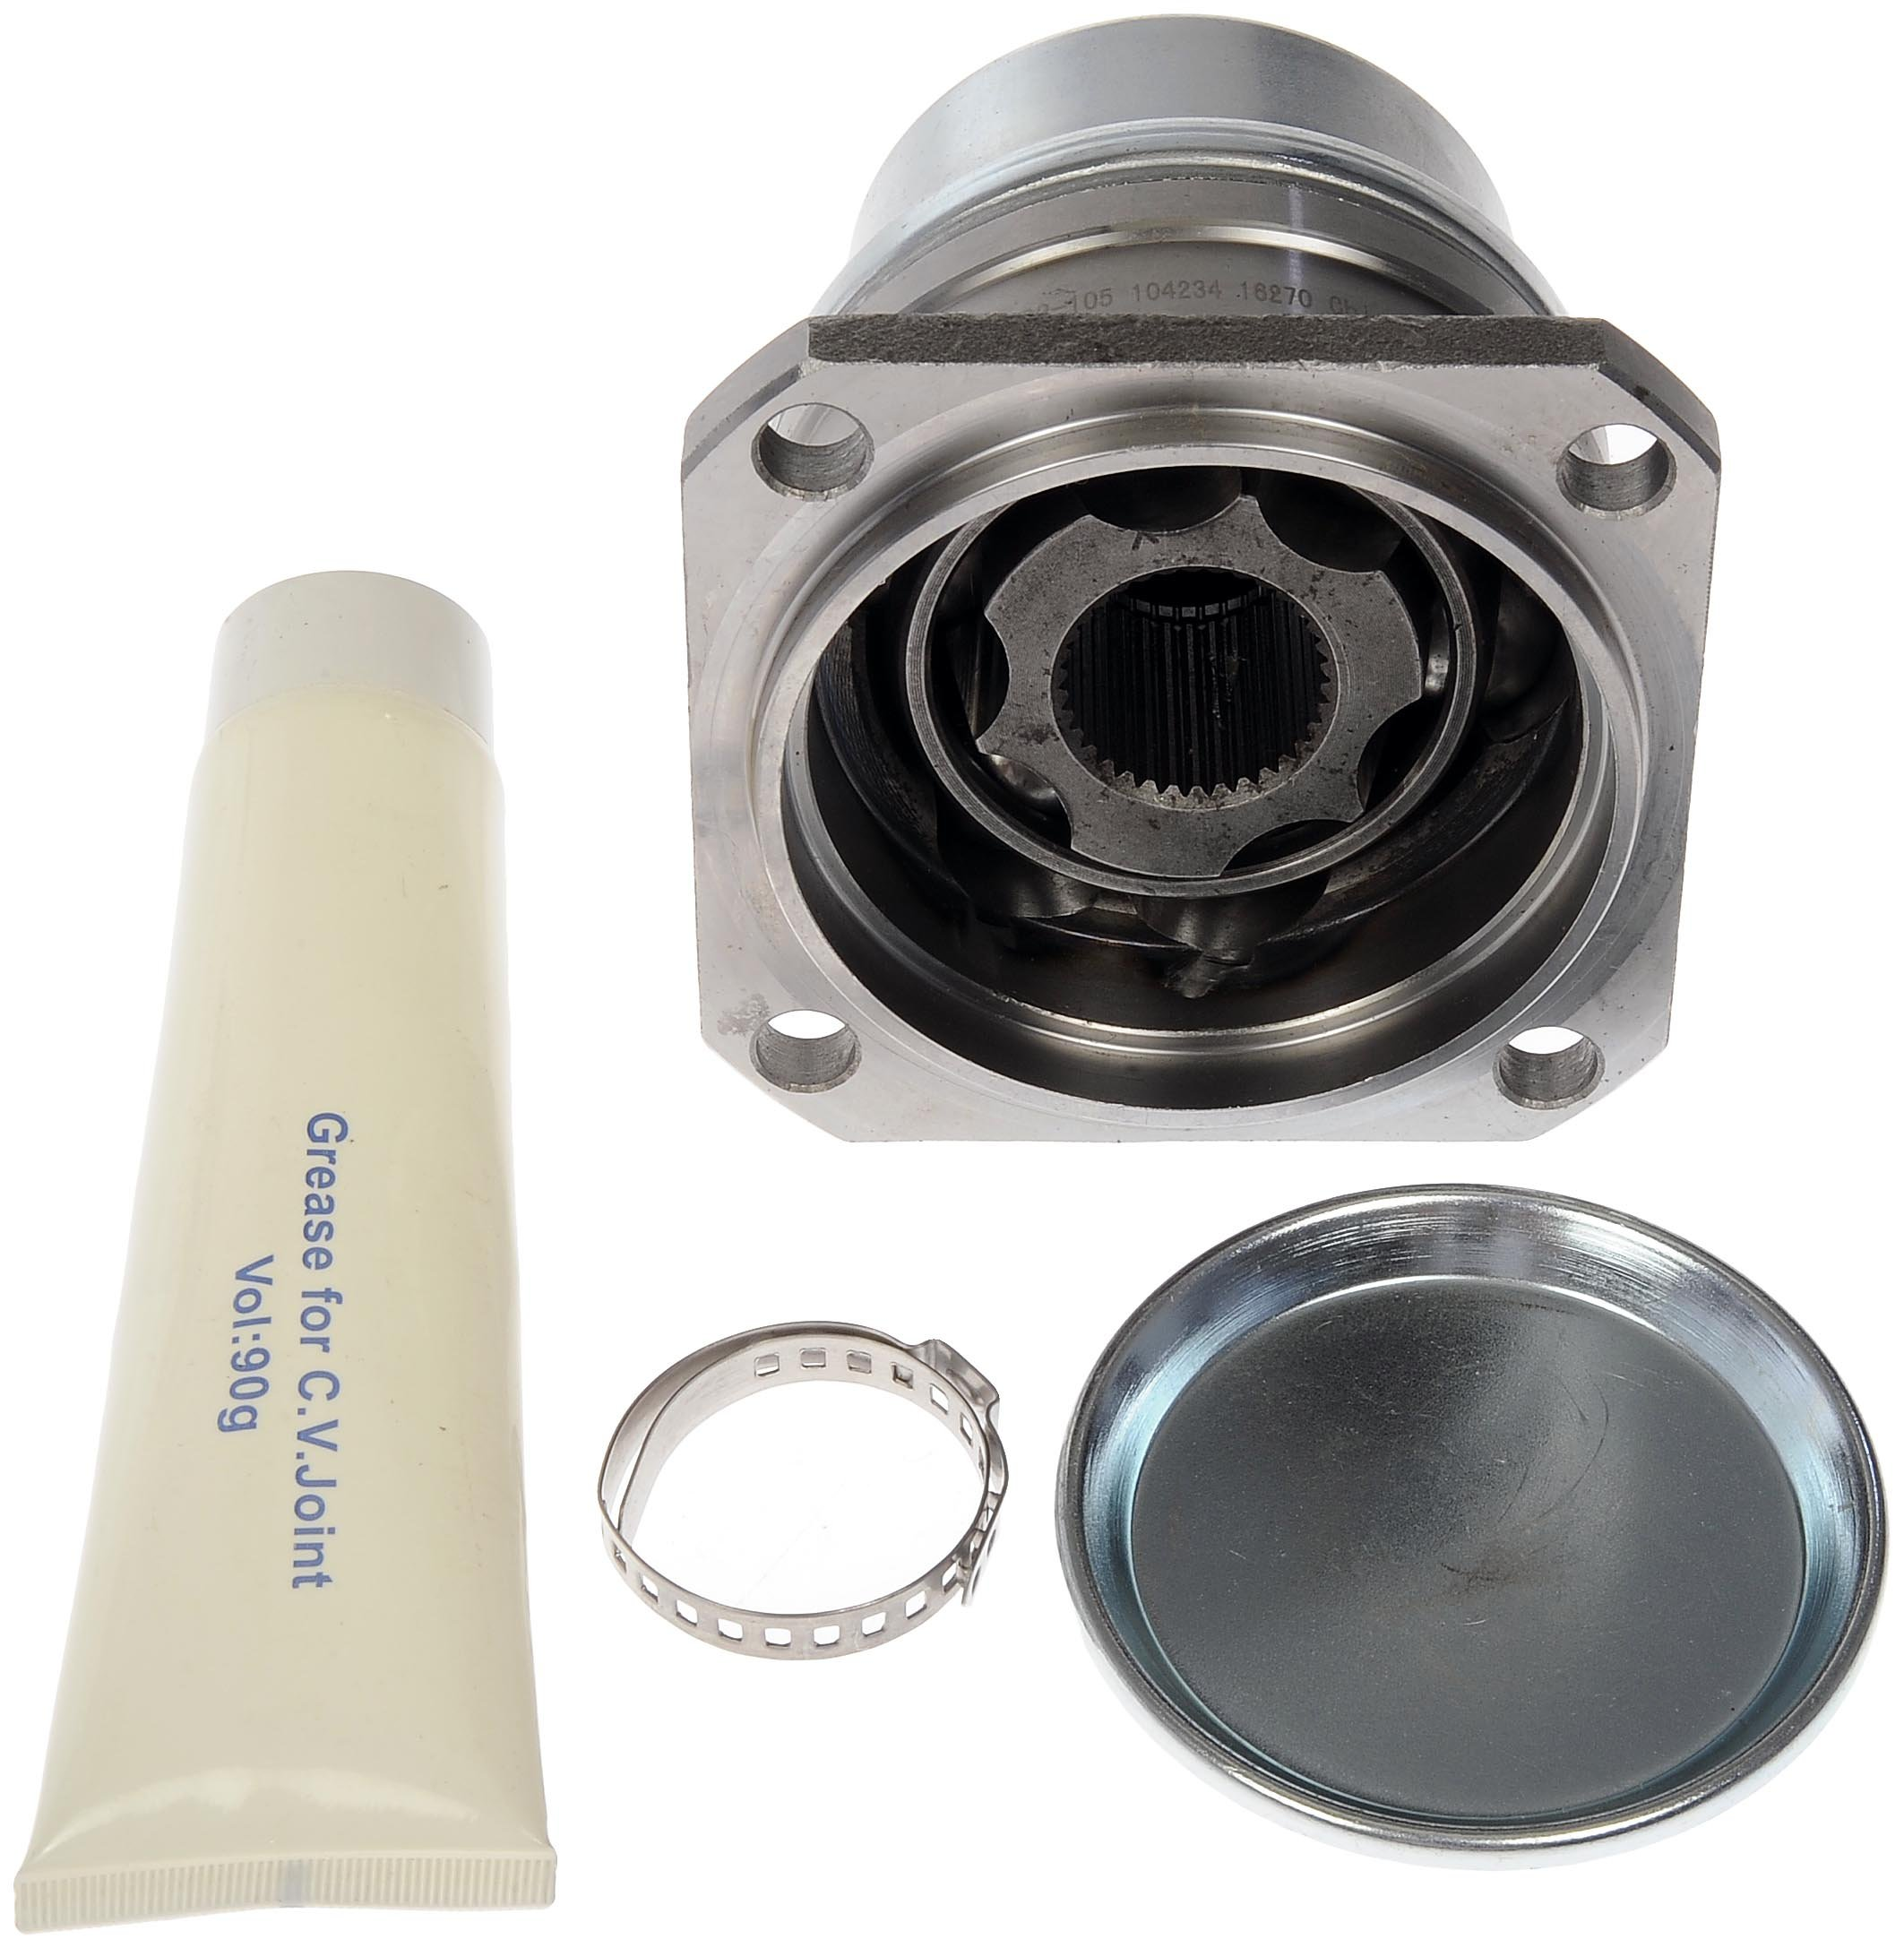 Dorman 932-105 High Speed Driveshaft CV Joint by Dorman (Image #2)